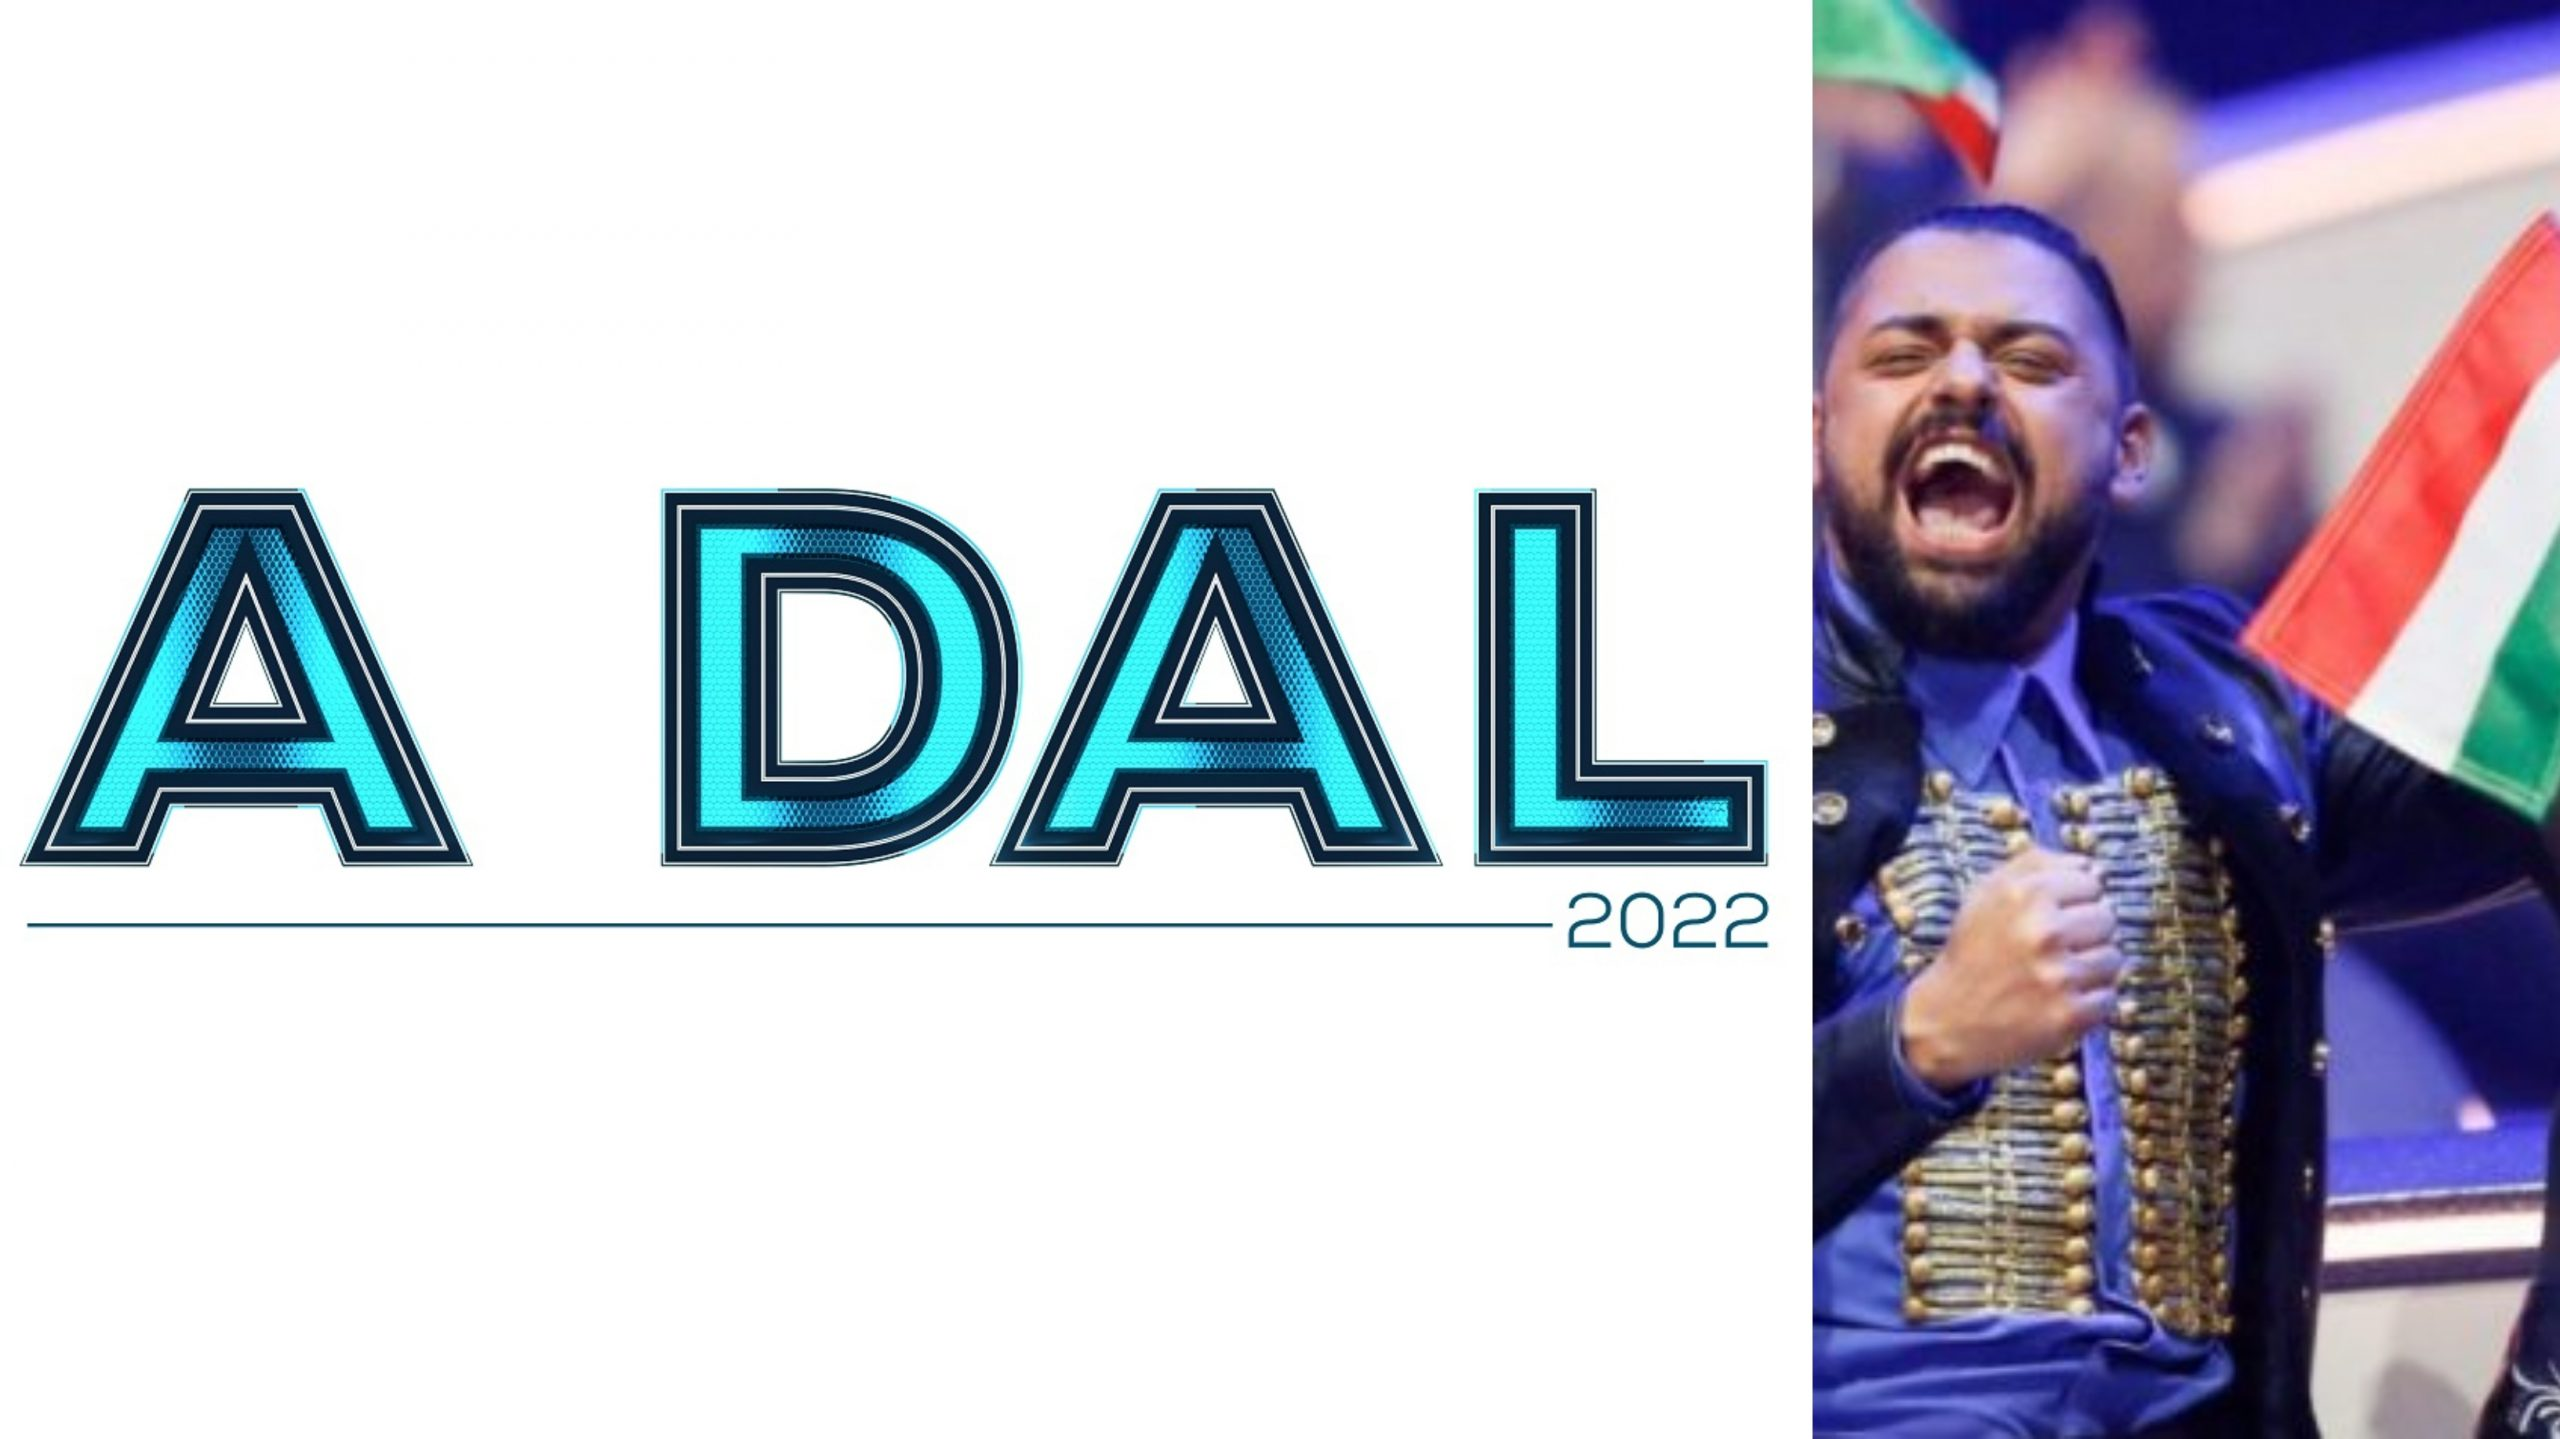 Eurowizja 2022, Węgry, A Dal